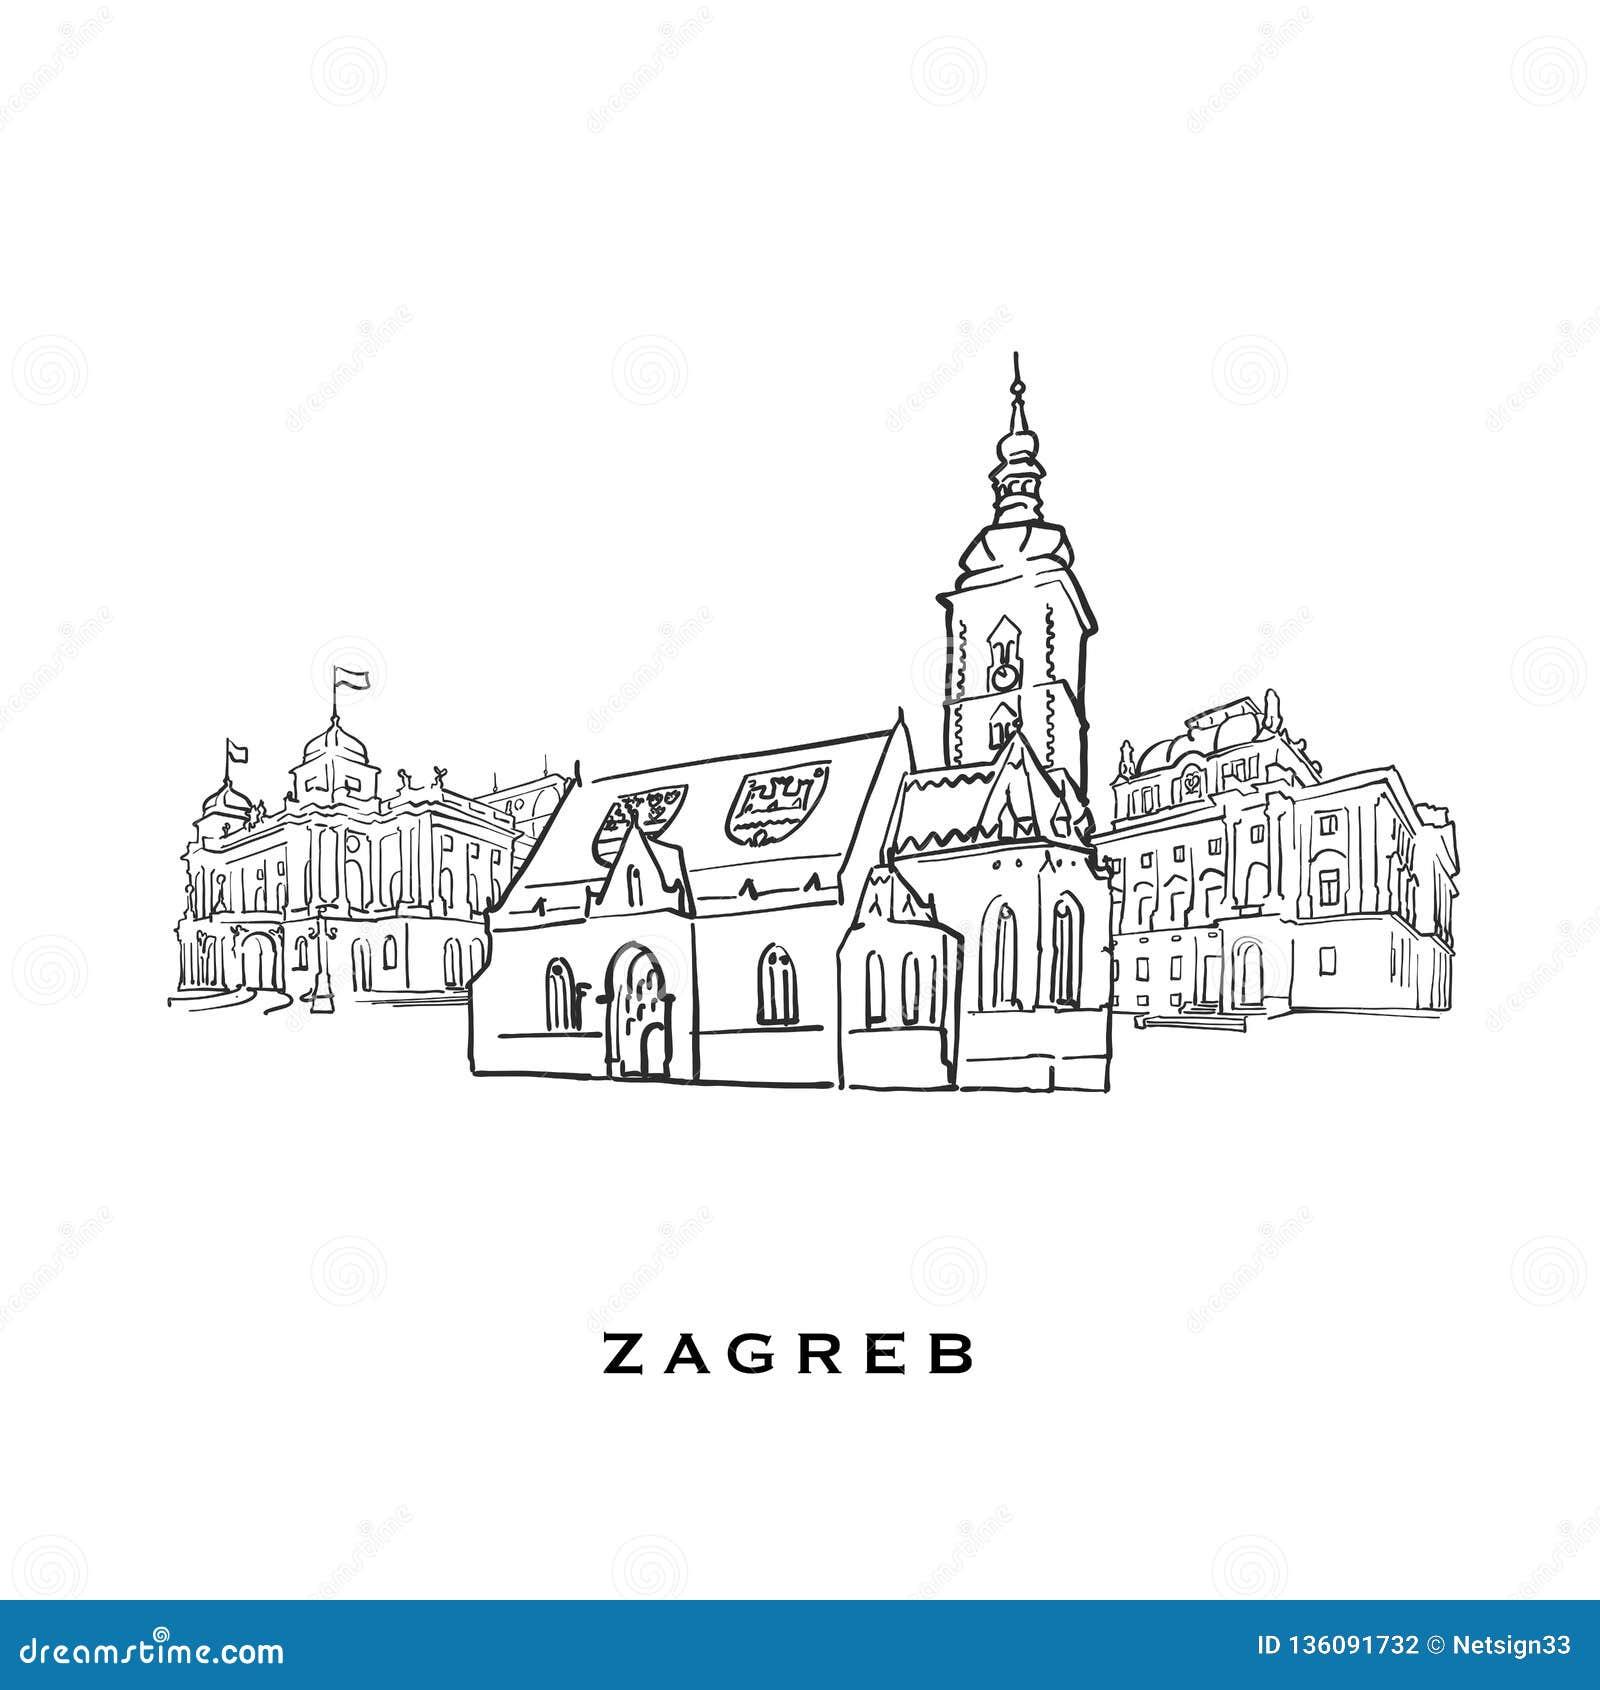 Zagreb Croatia Famous Architecture Stock Vector - Illustration of